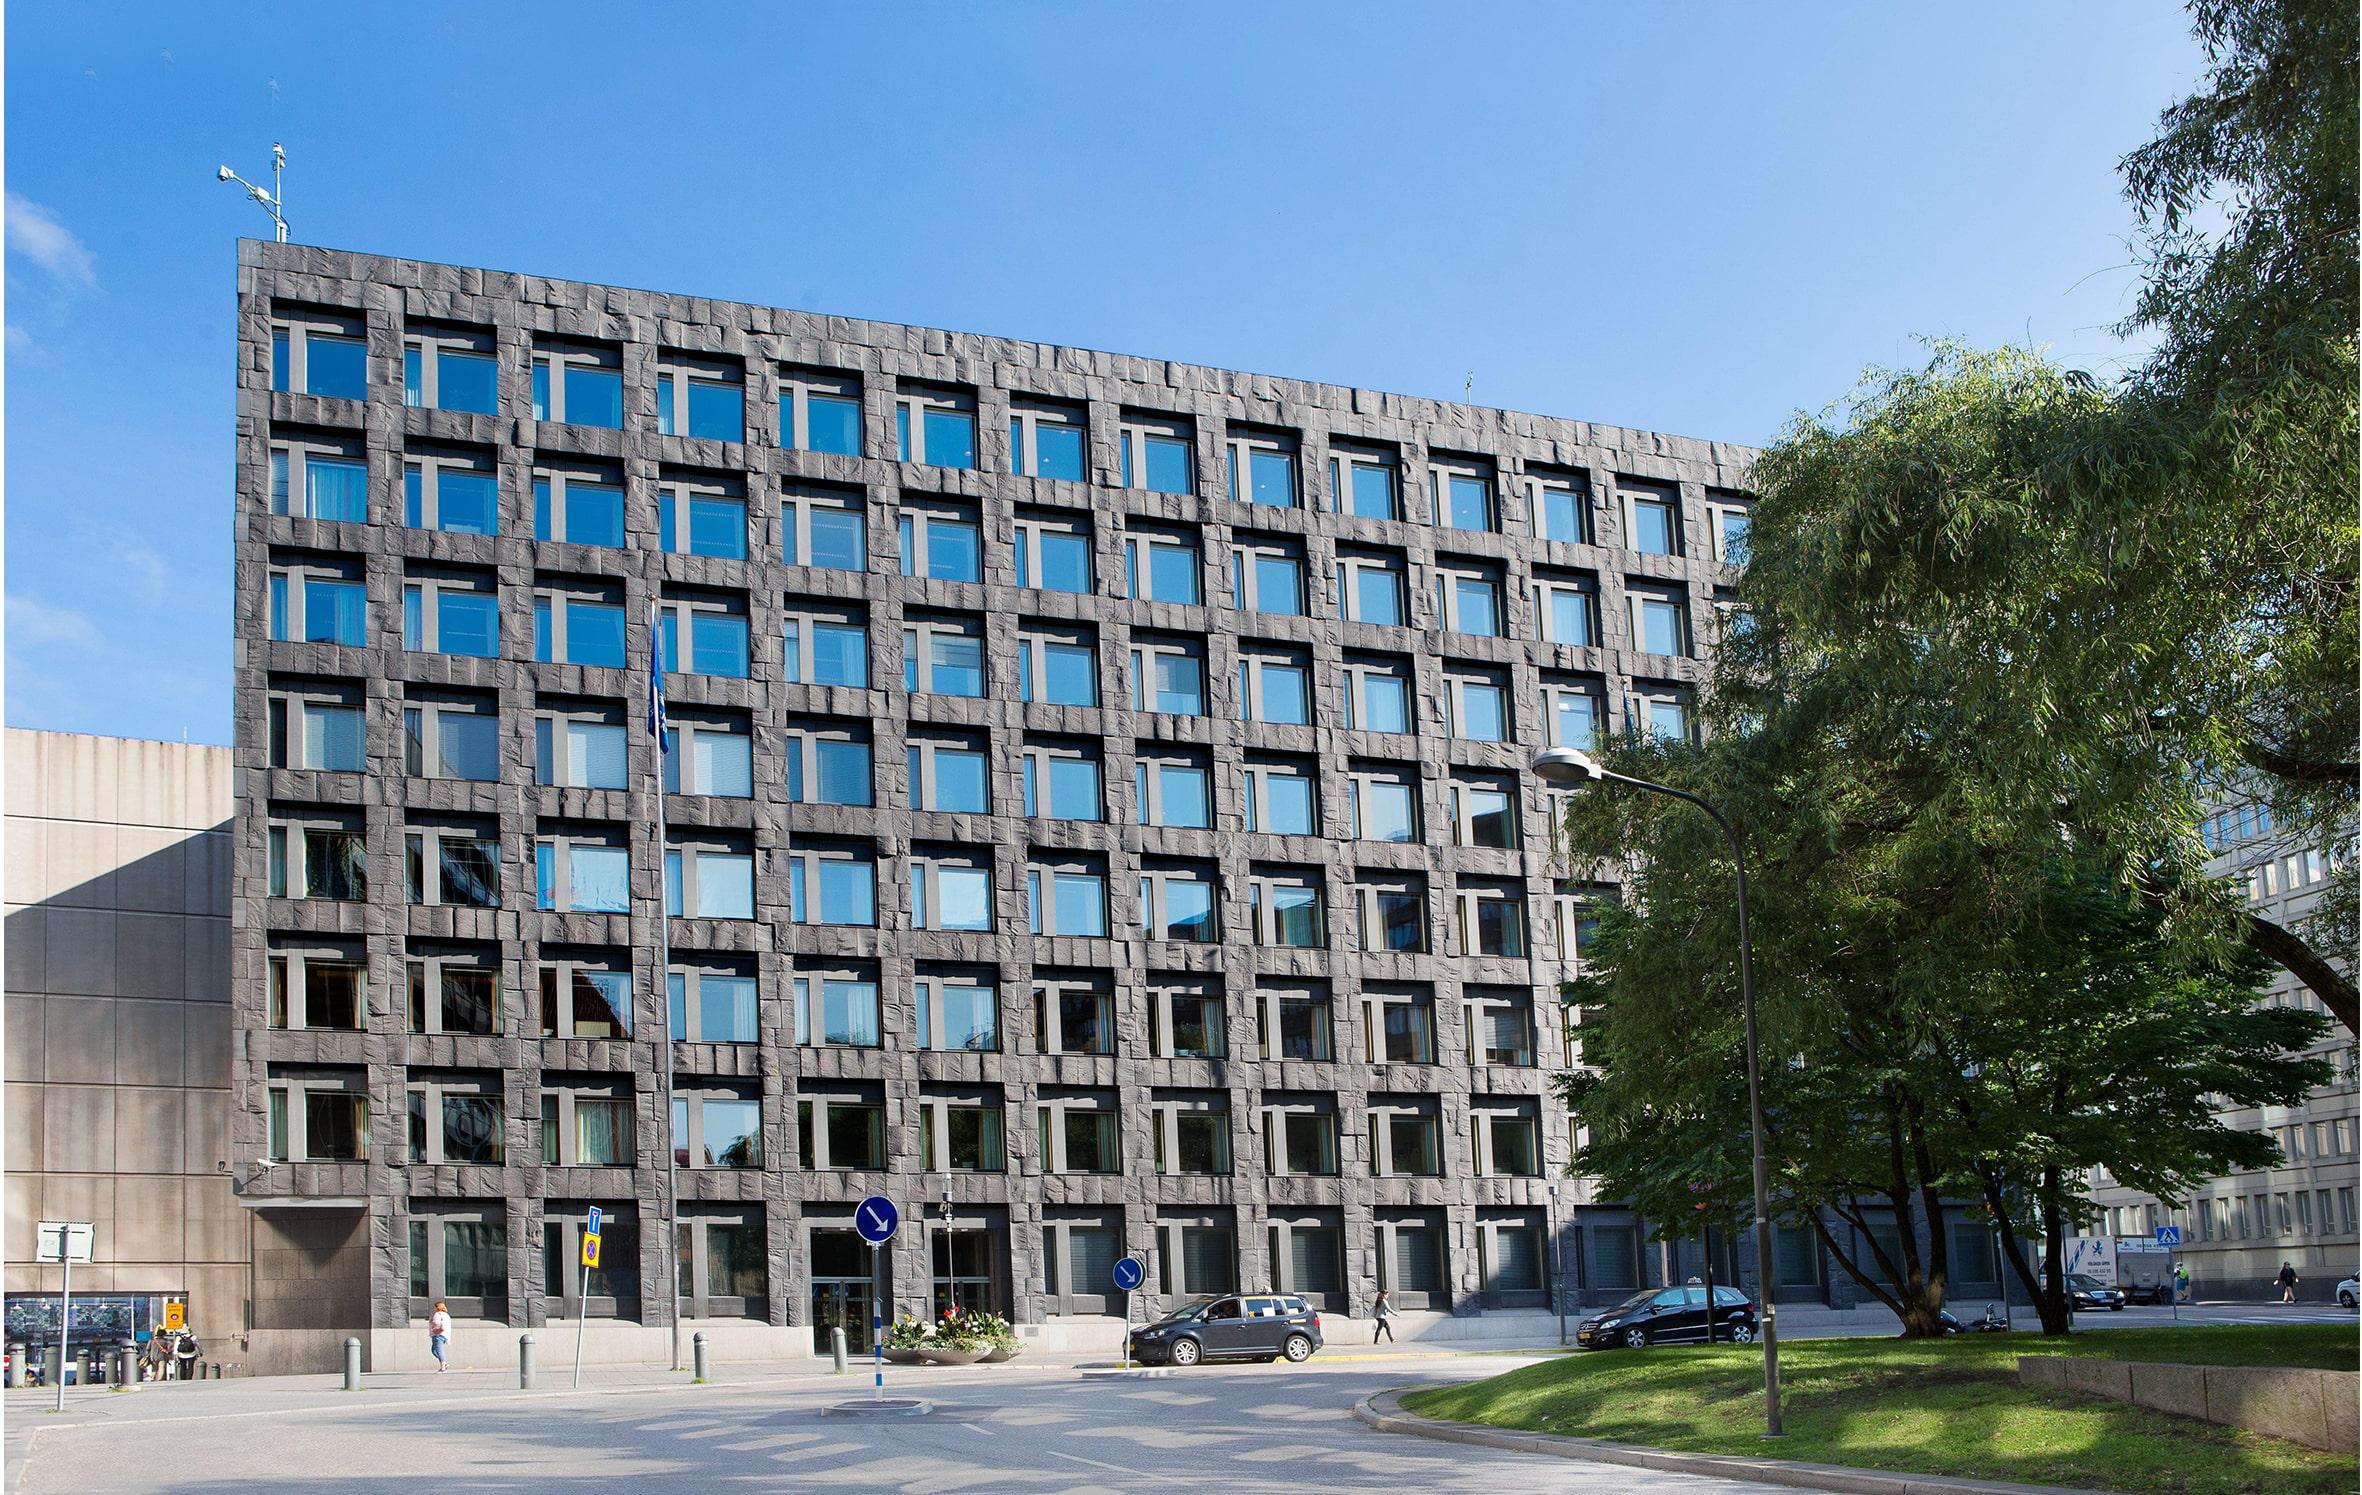 riksbankhusets utsida